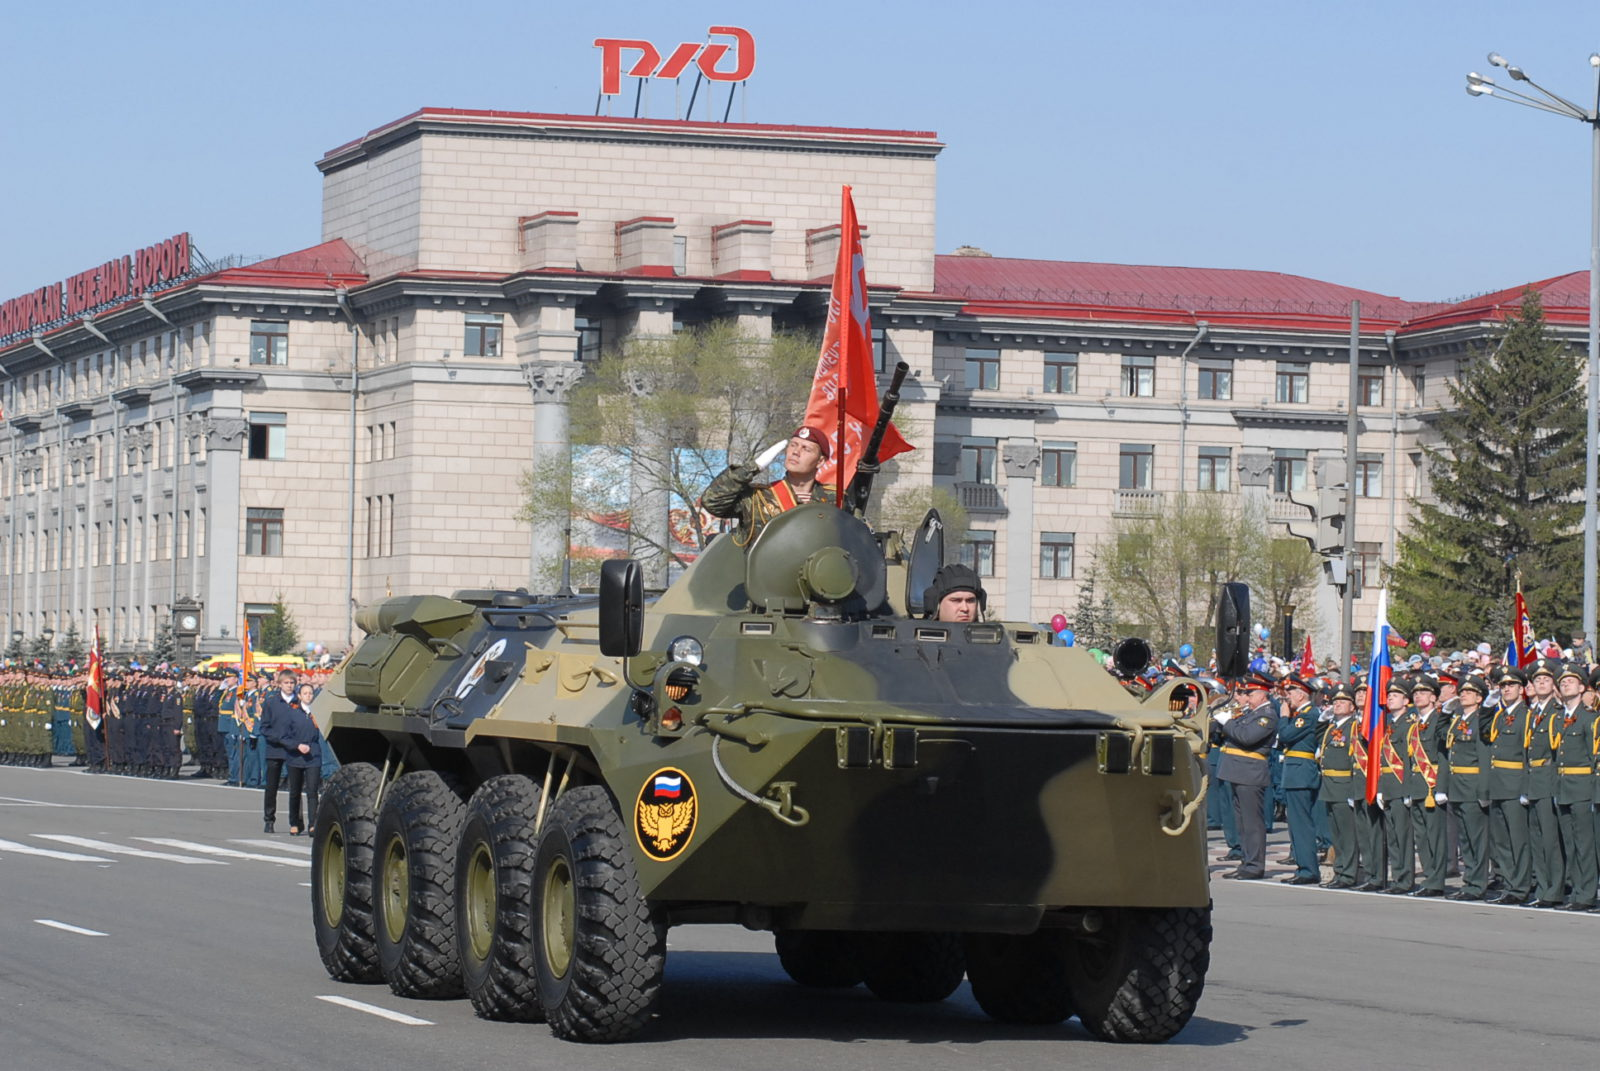 Во сколько будет парад 9 мая в красноярске